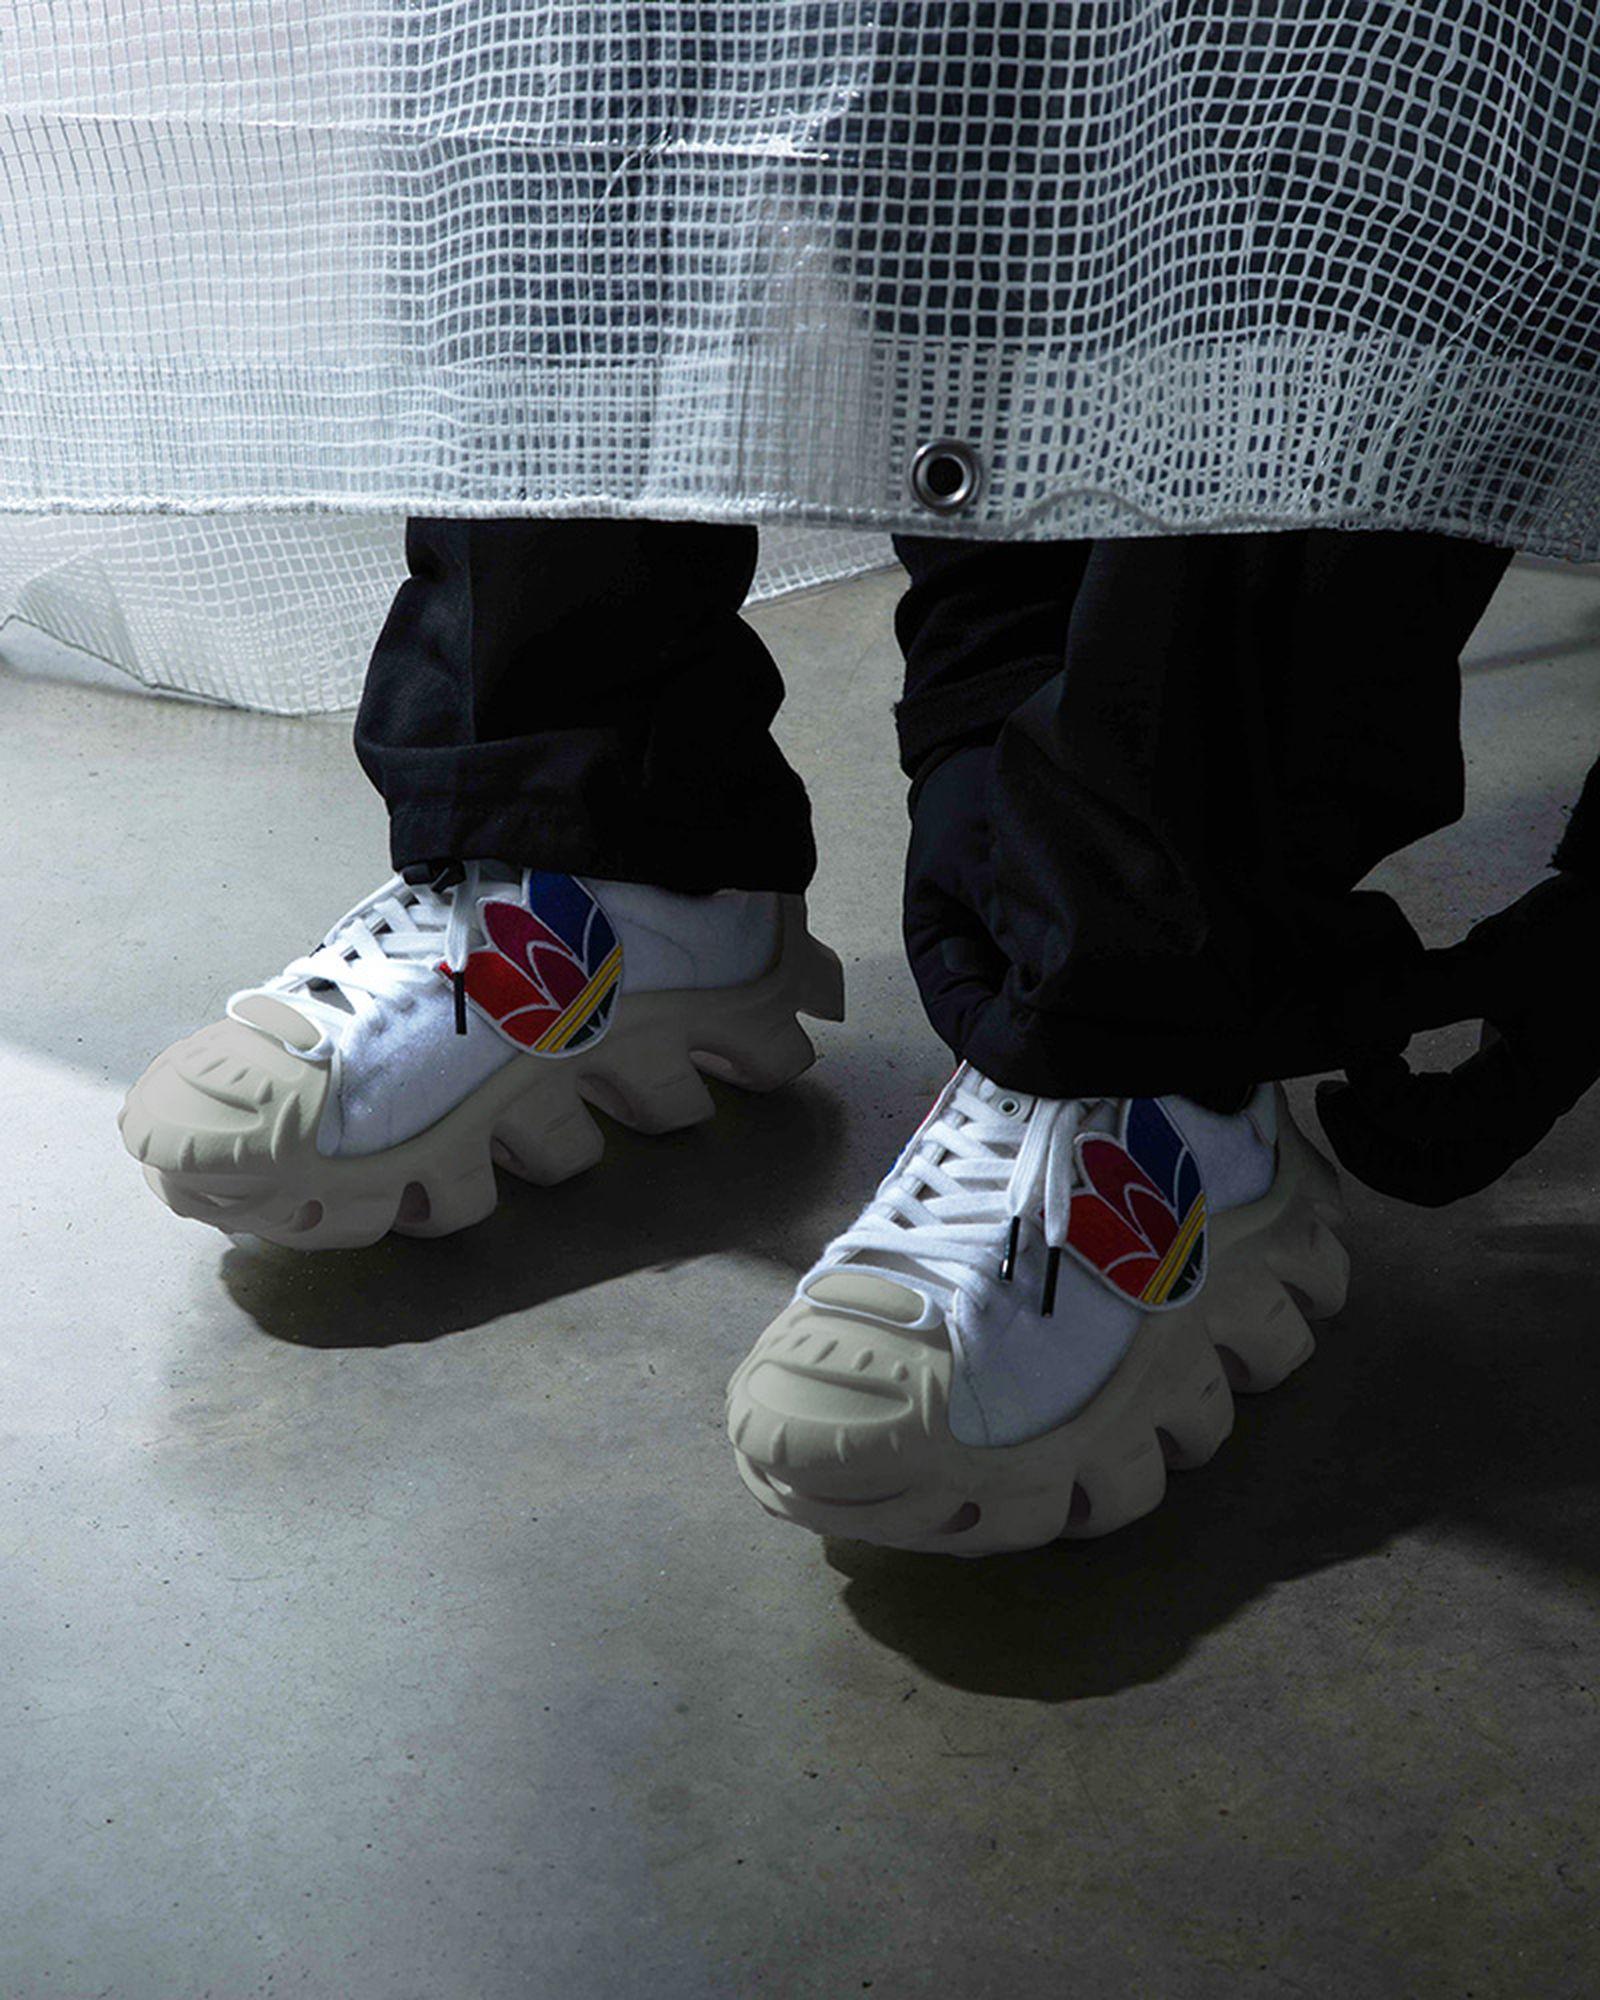 mr-bailey-ammonite-adidas-superstar-04